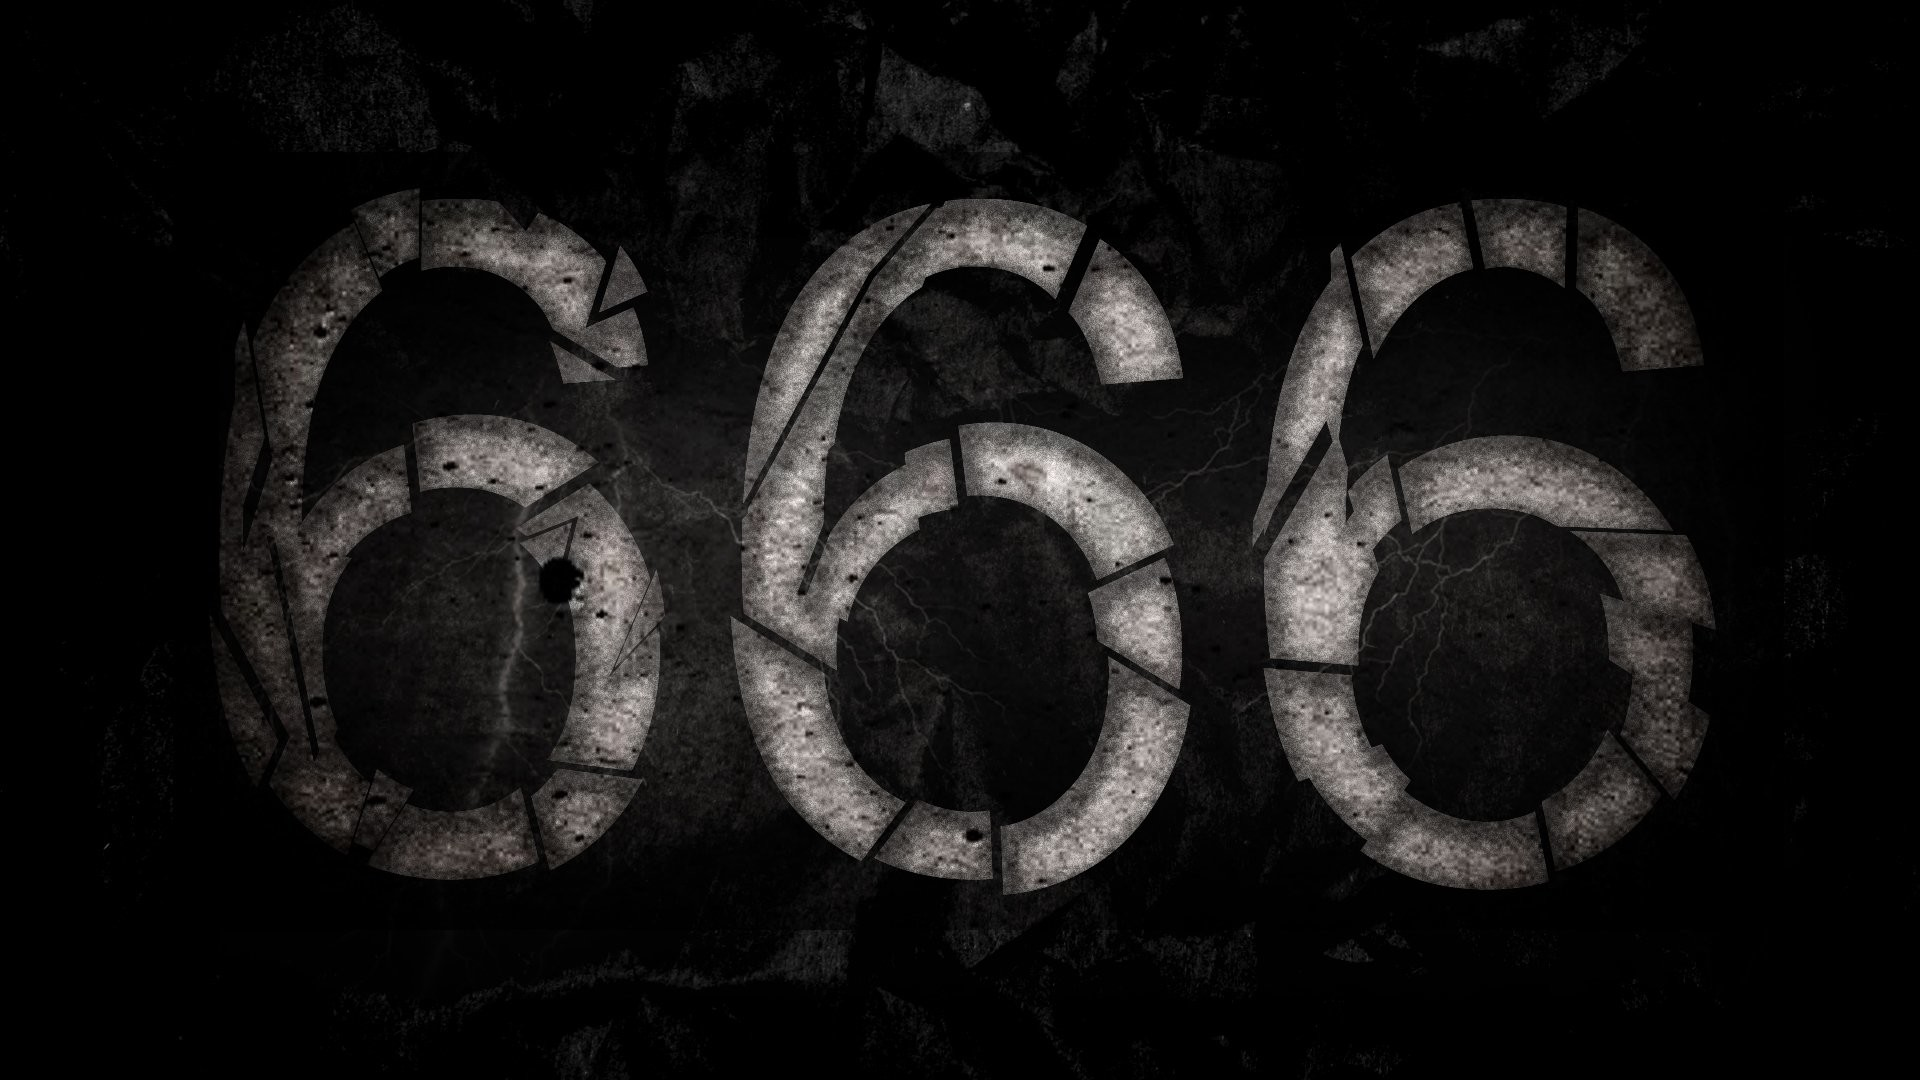 Occult satan satanic 666 evil wallpaper     324577 .